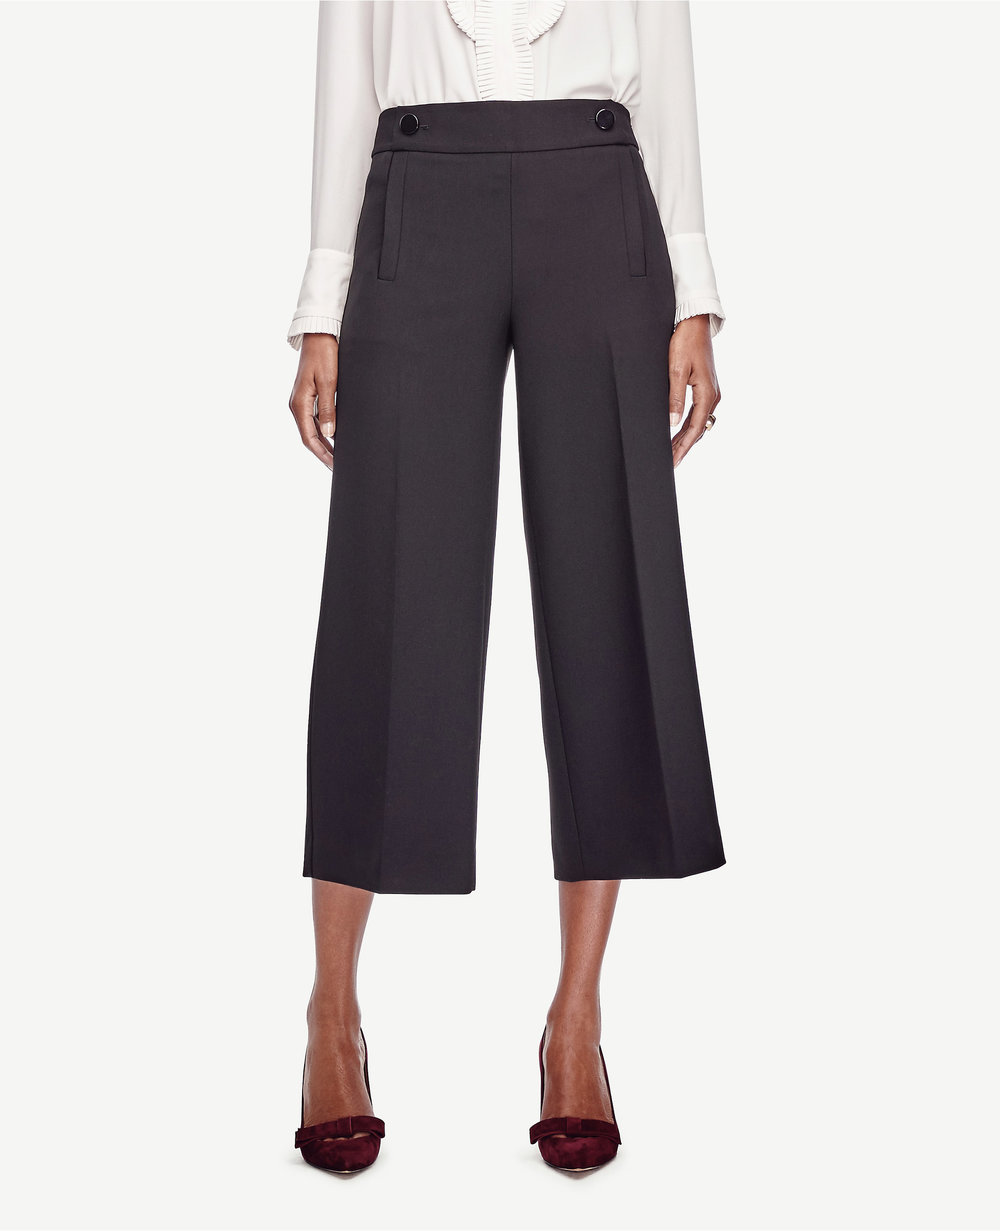 Mariner Wide Leg Crop Pants. Ann Taylor. $98.